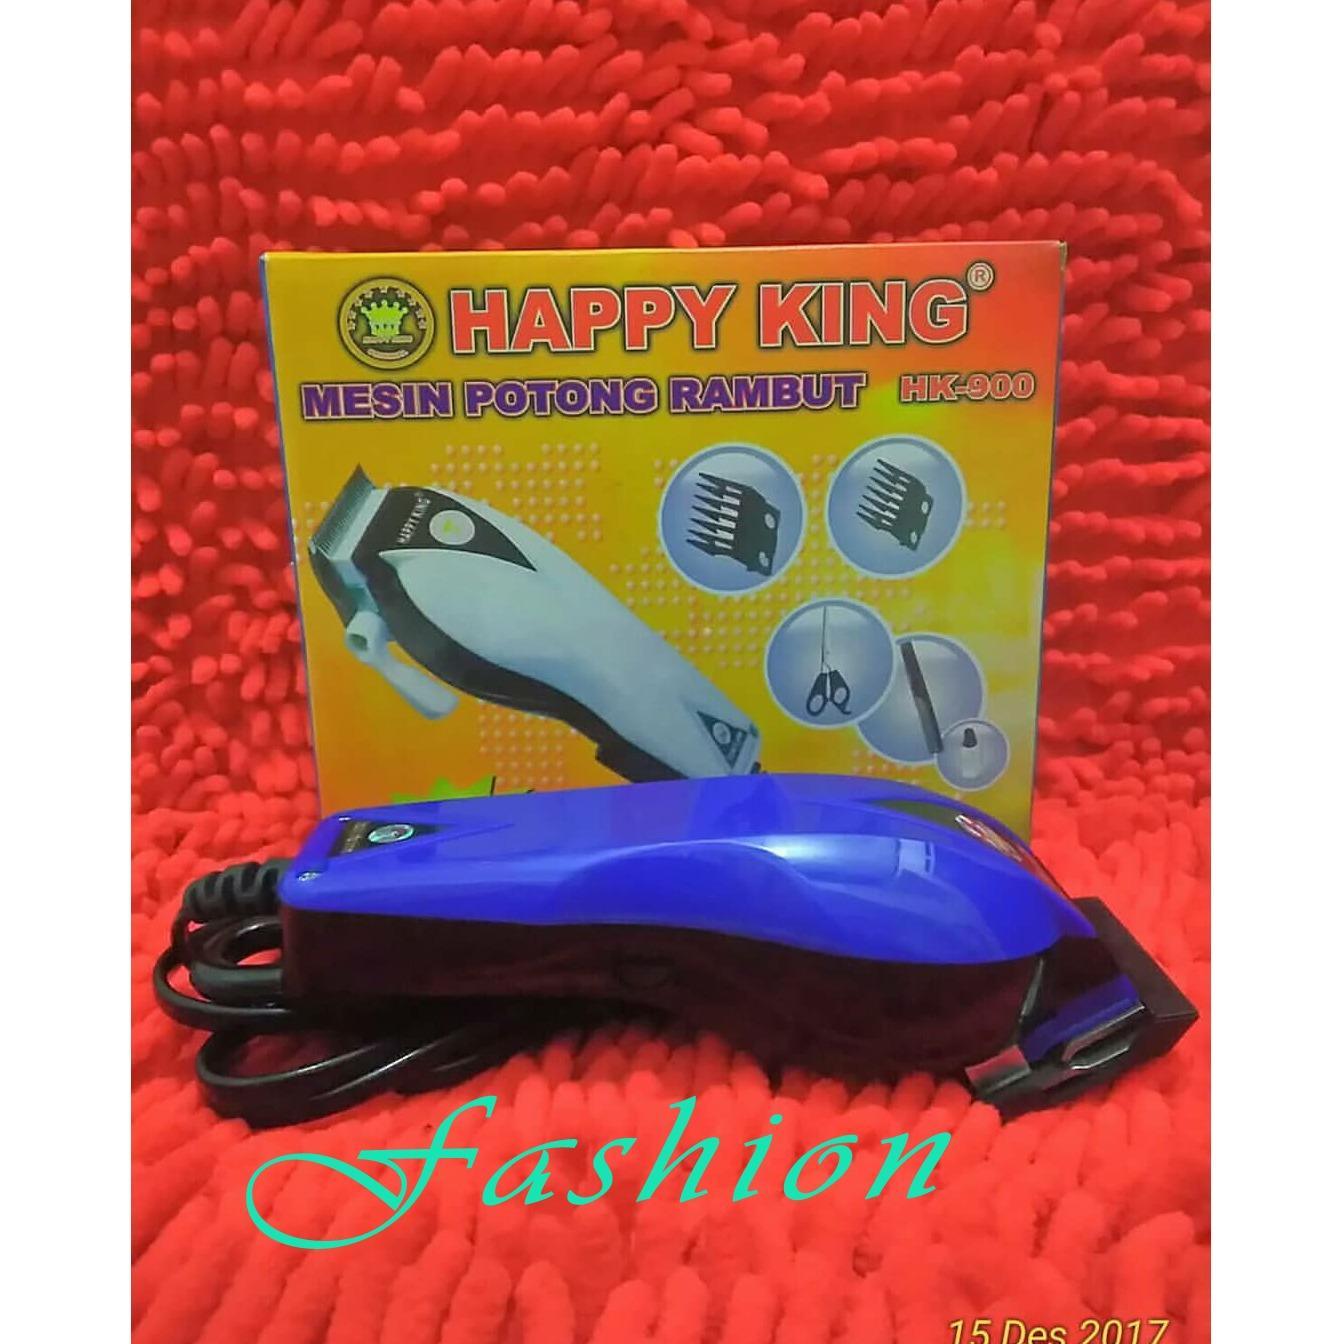 Happy King Hk 900 Alat Cukur Rambut Hair Clipper Trimmer Mesin 803 Listrik Terbaik Potong Pangkas